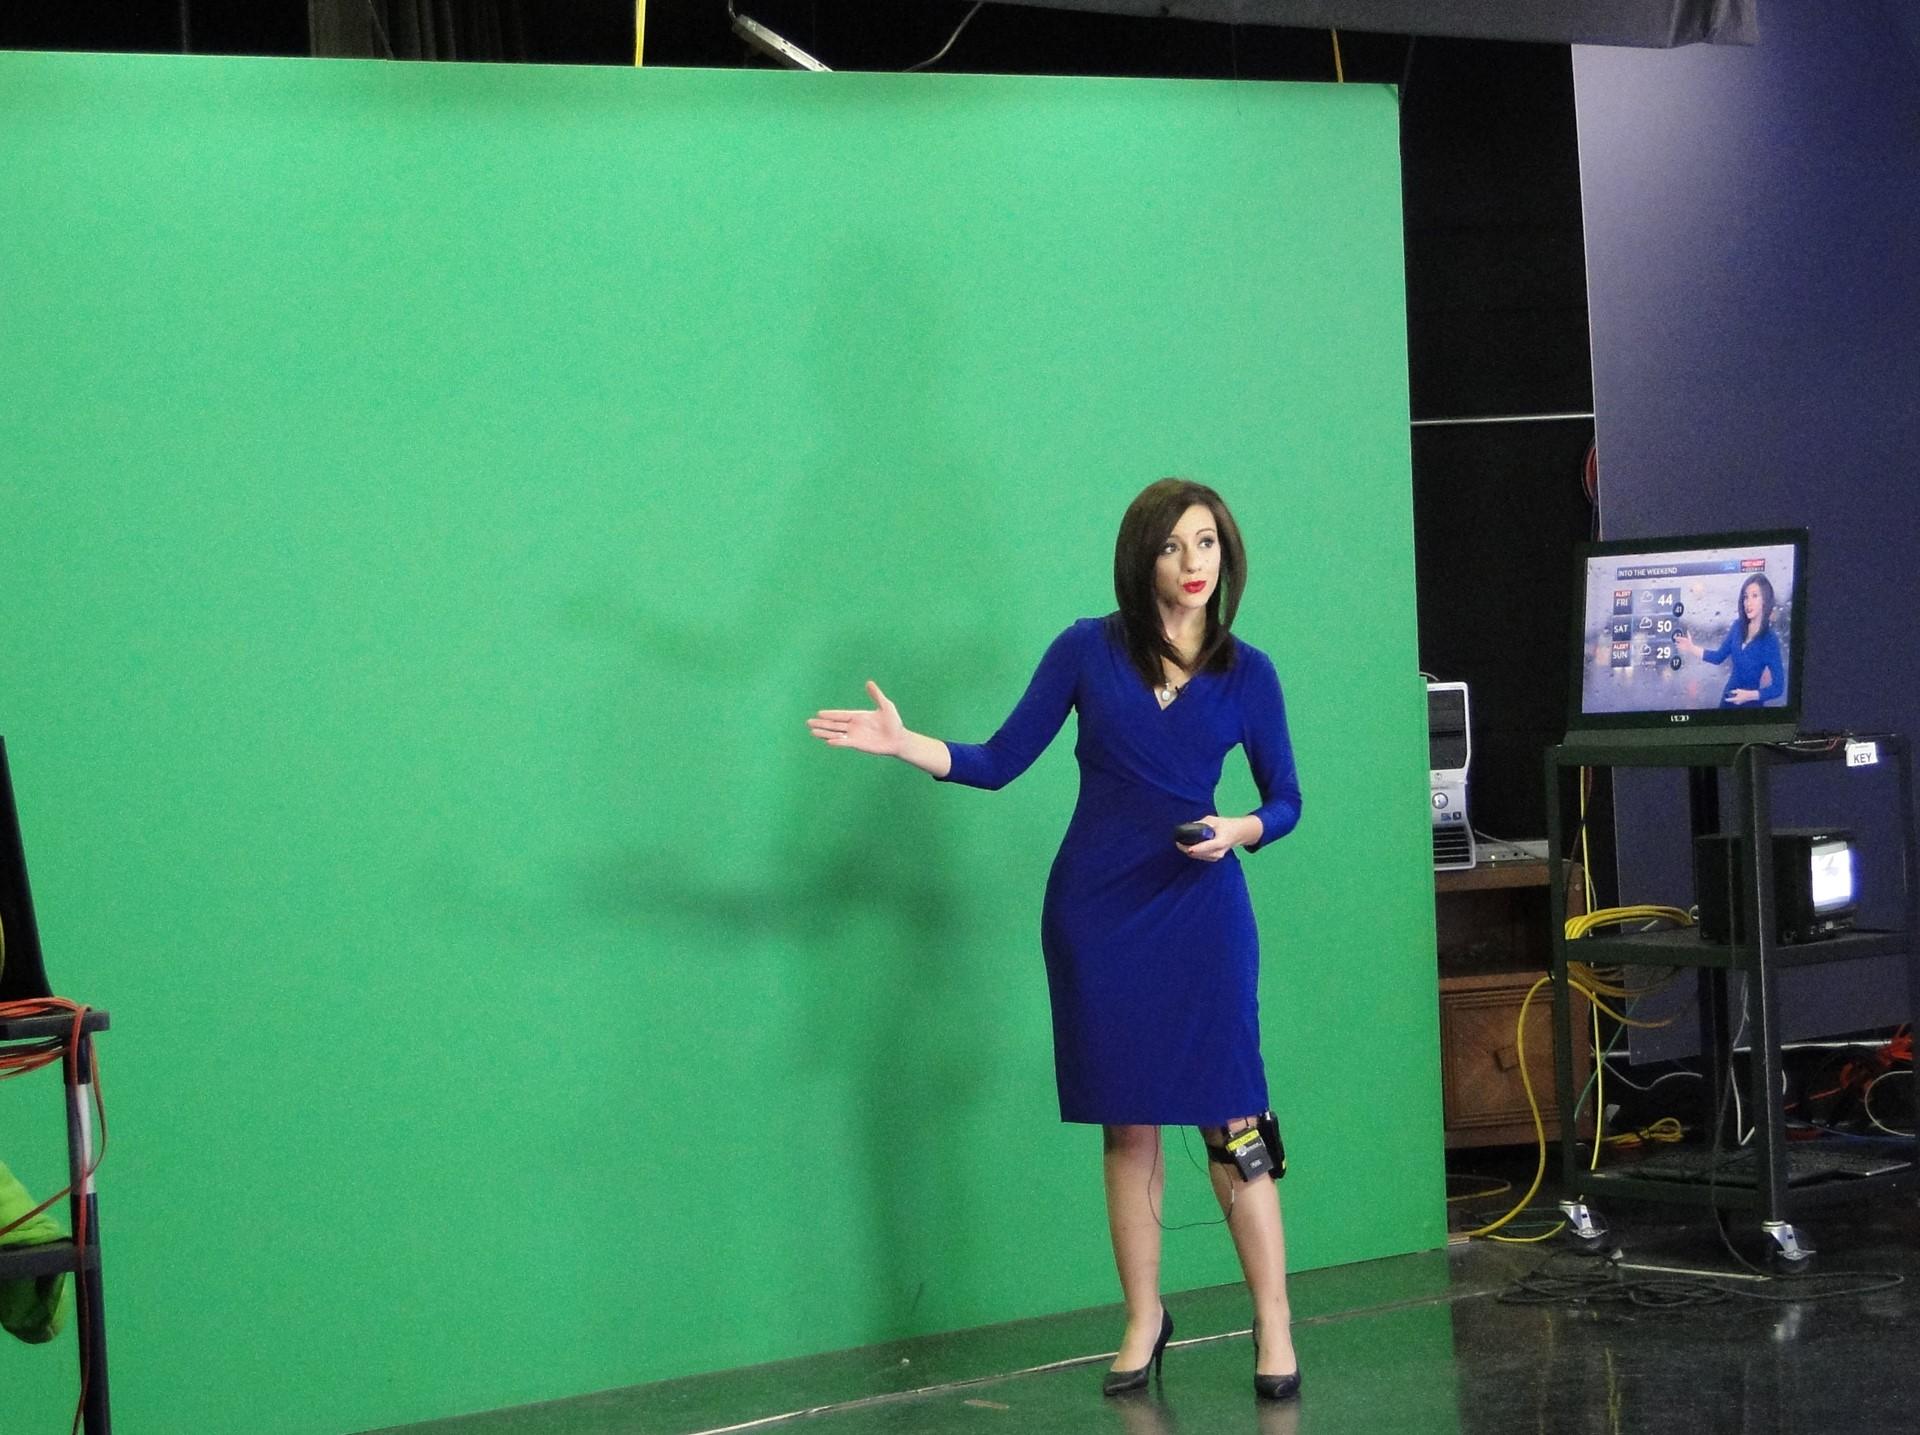 Meteorologist Samantha Roberts at green screen.